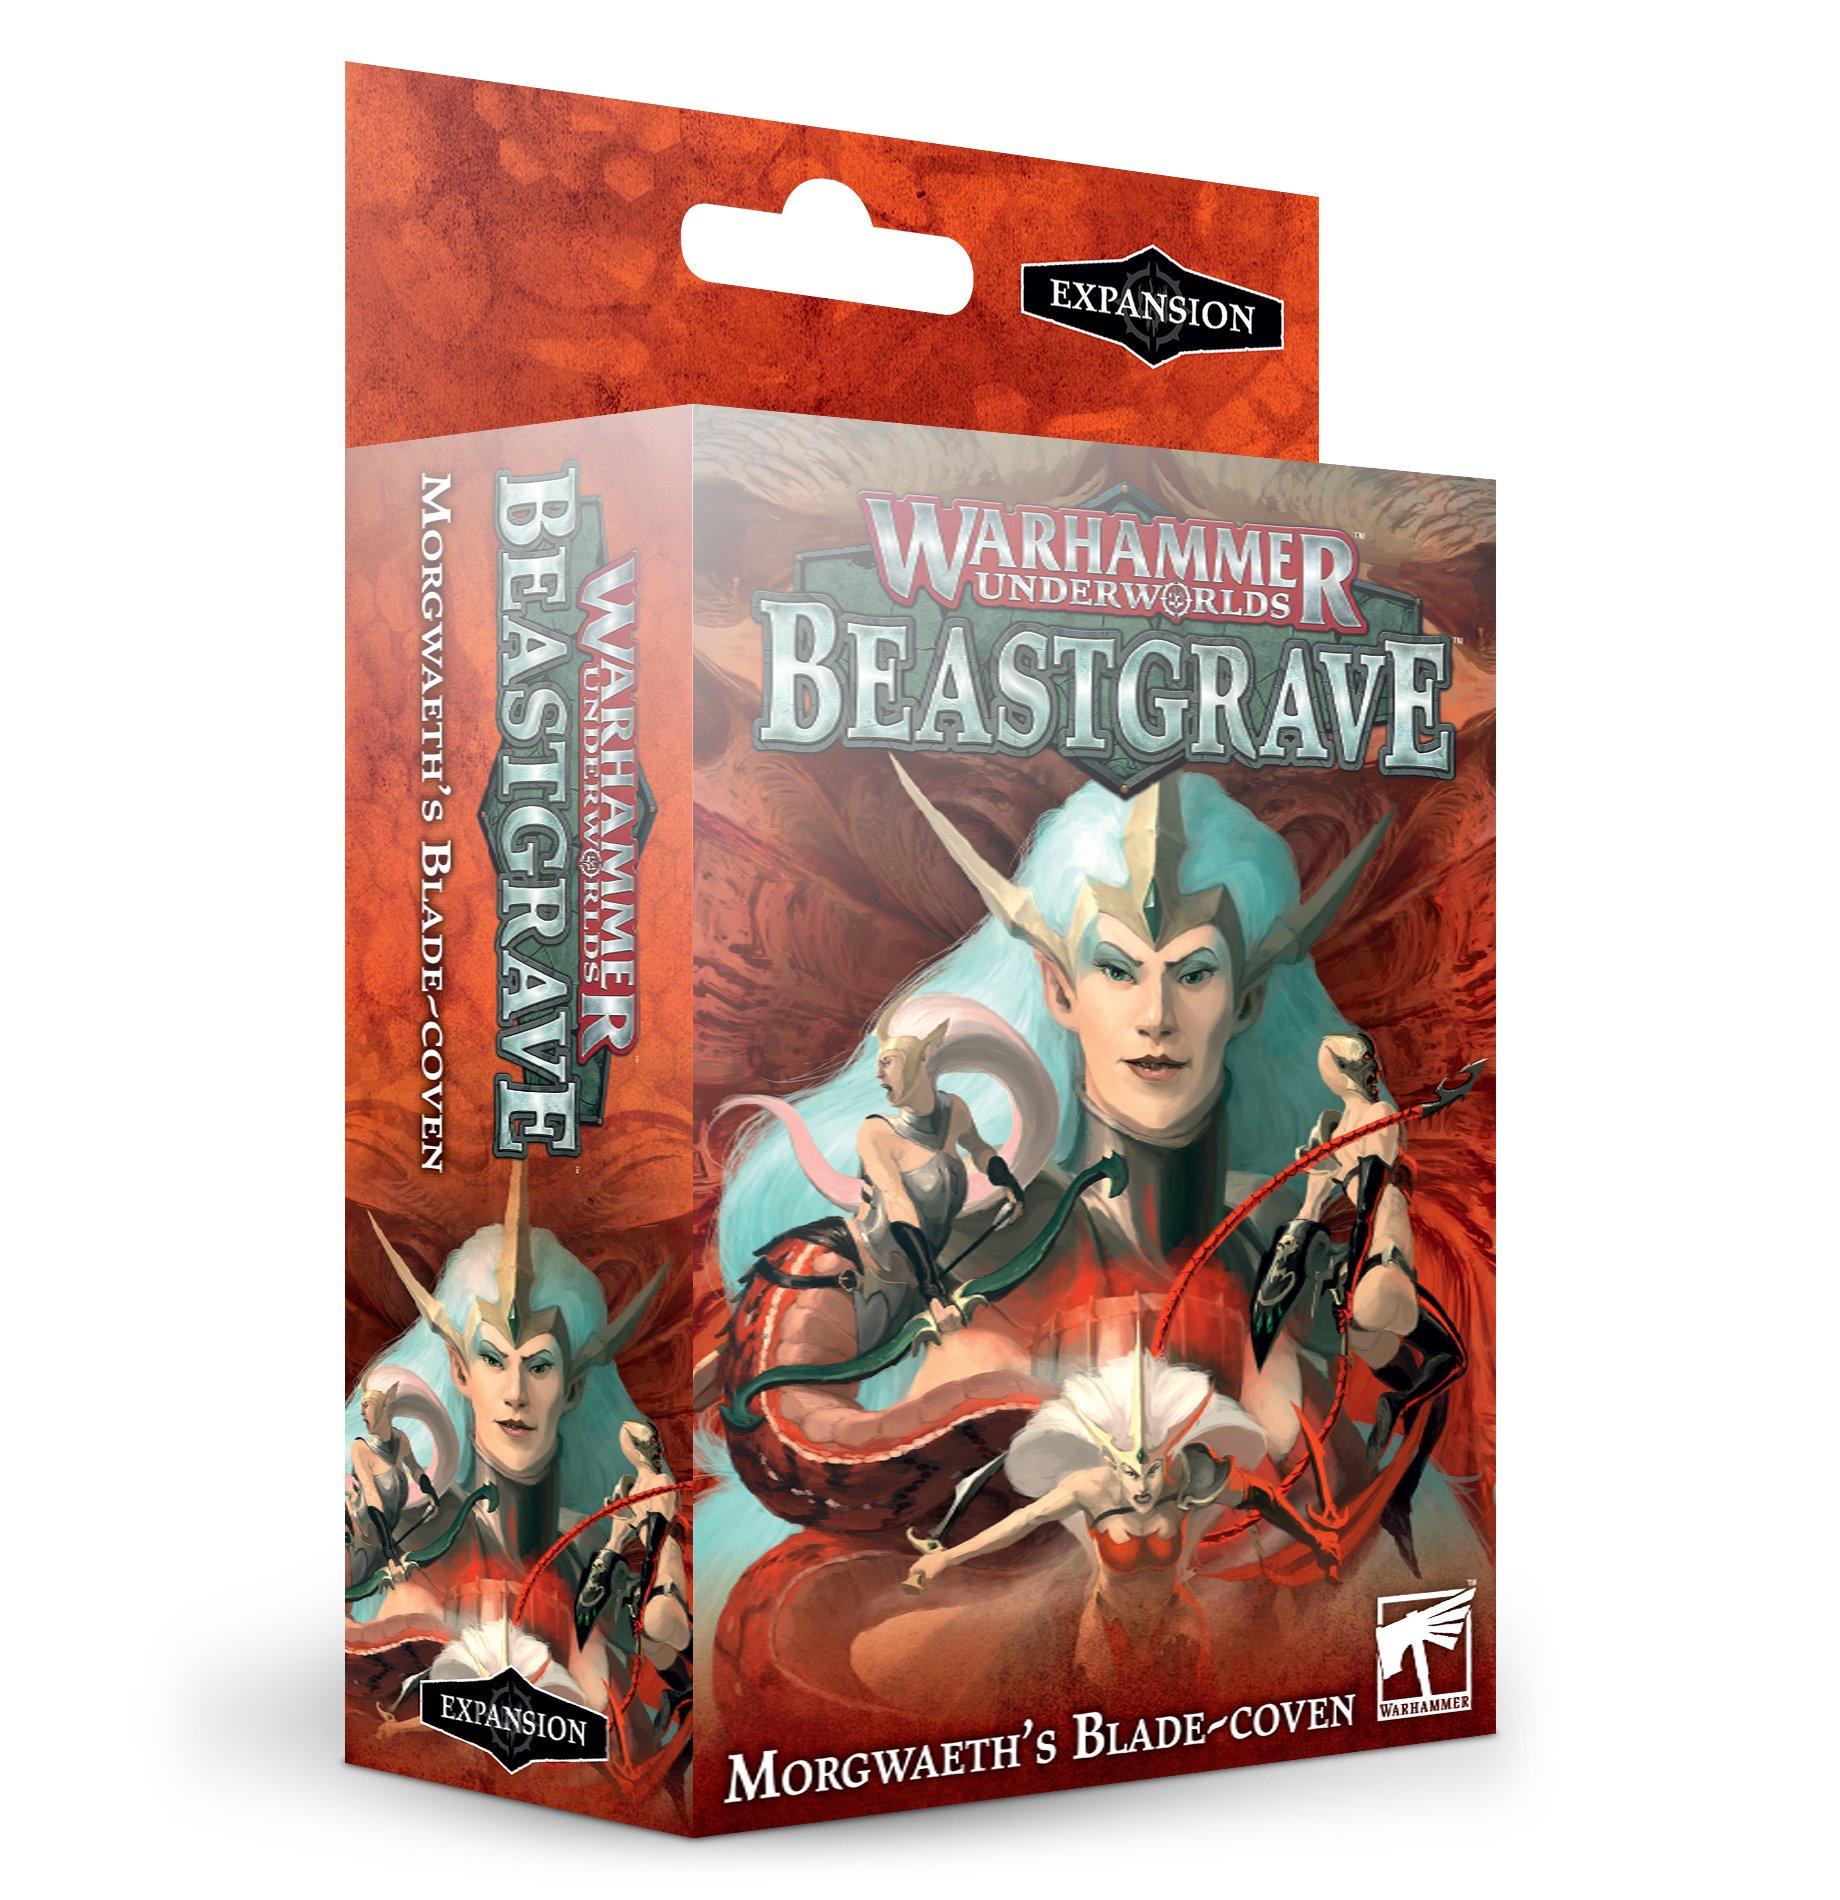 Morgwaeths Blade Coven